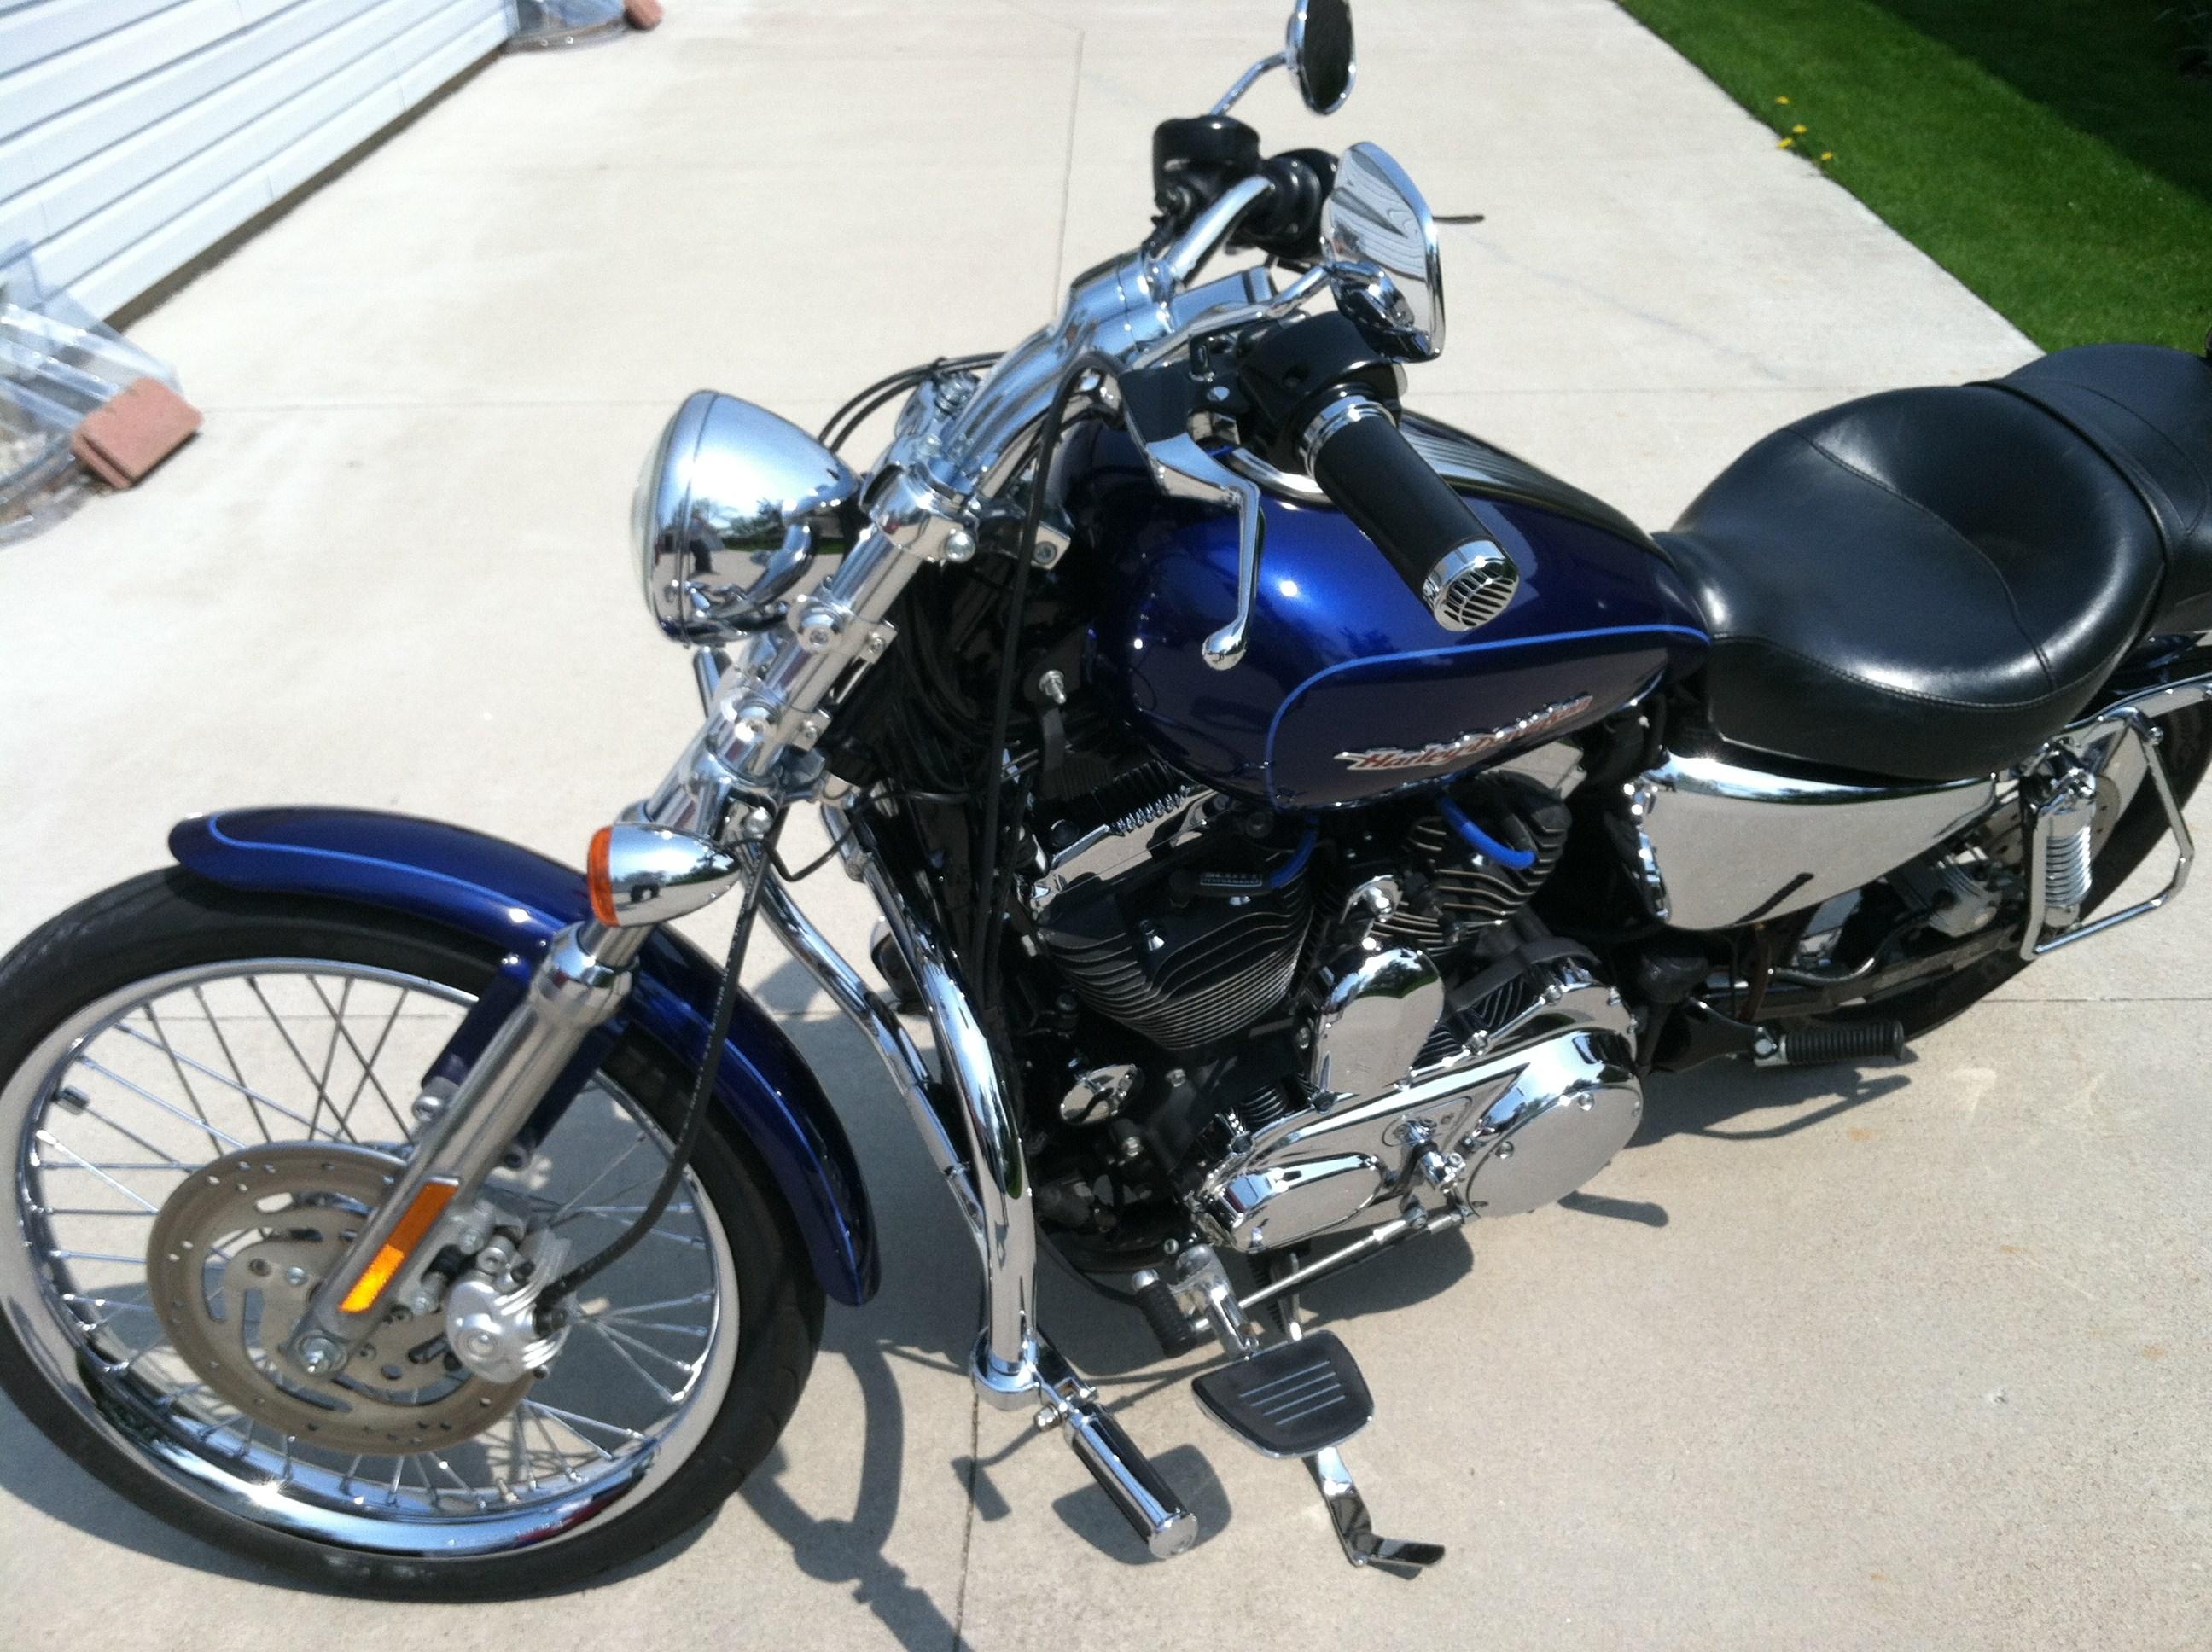 2006 Harley Davidson 174 Xl1200c Sportster 174 1200 Custom Blue